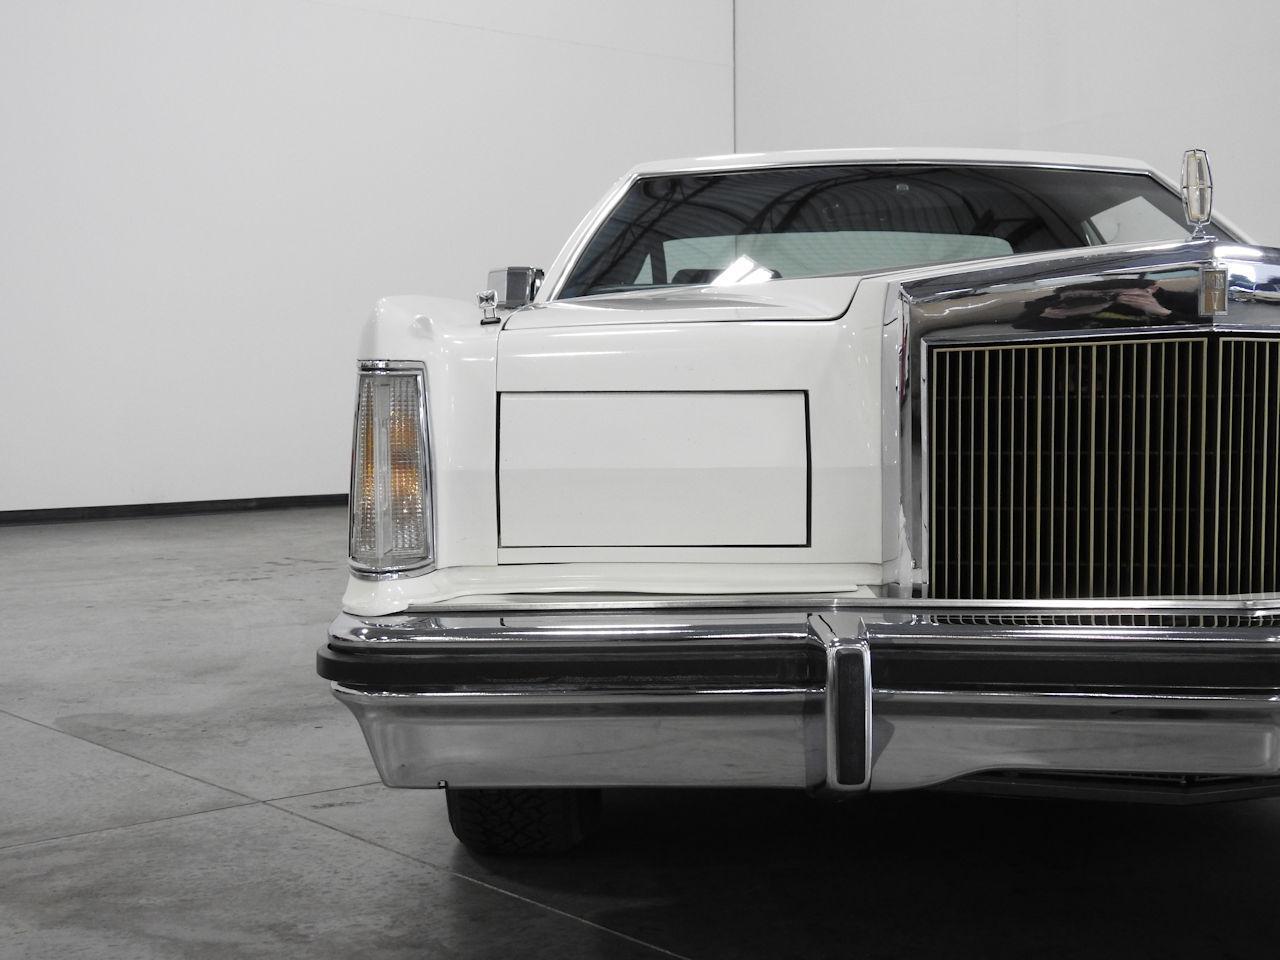 1979 Lincoln MKV 47